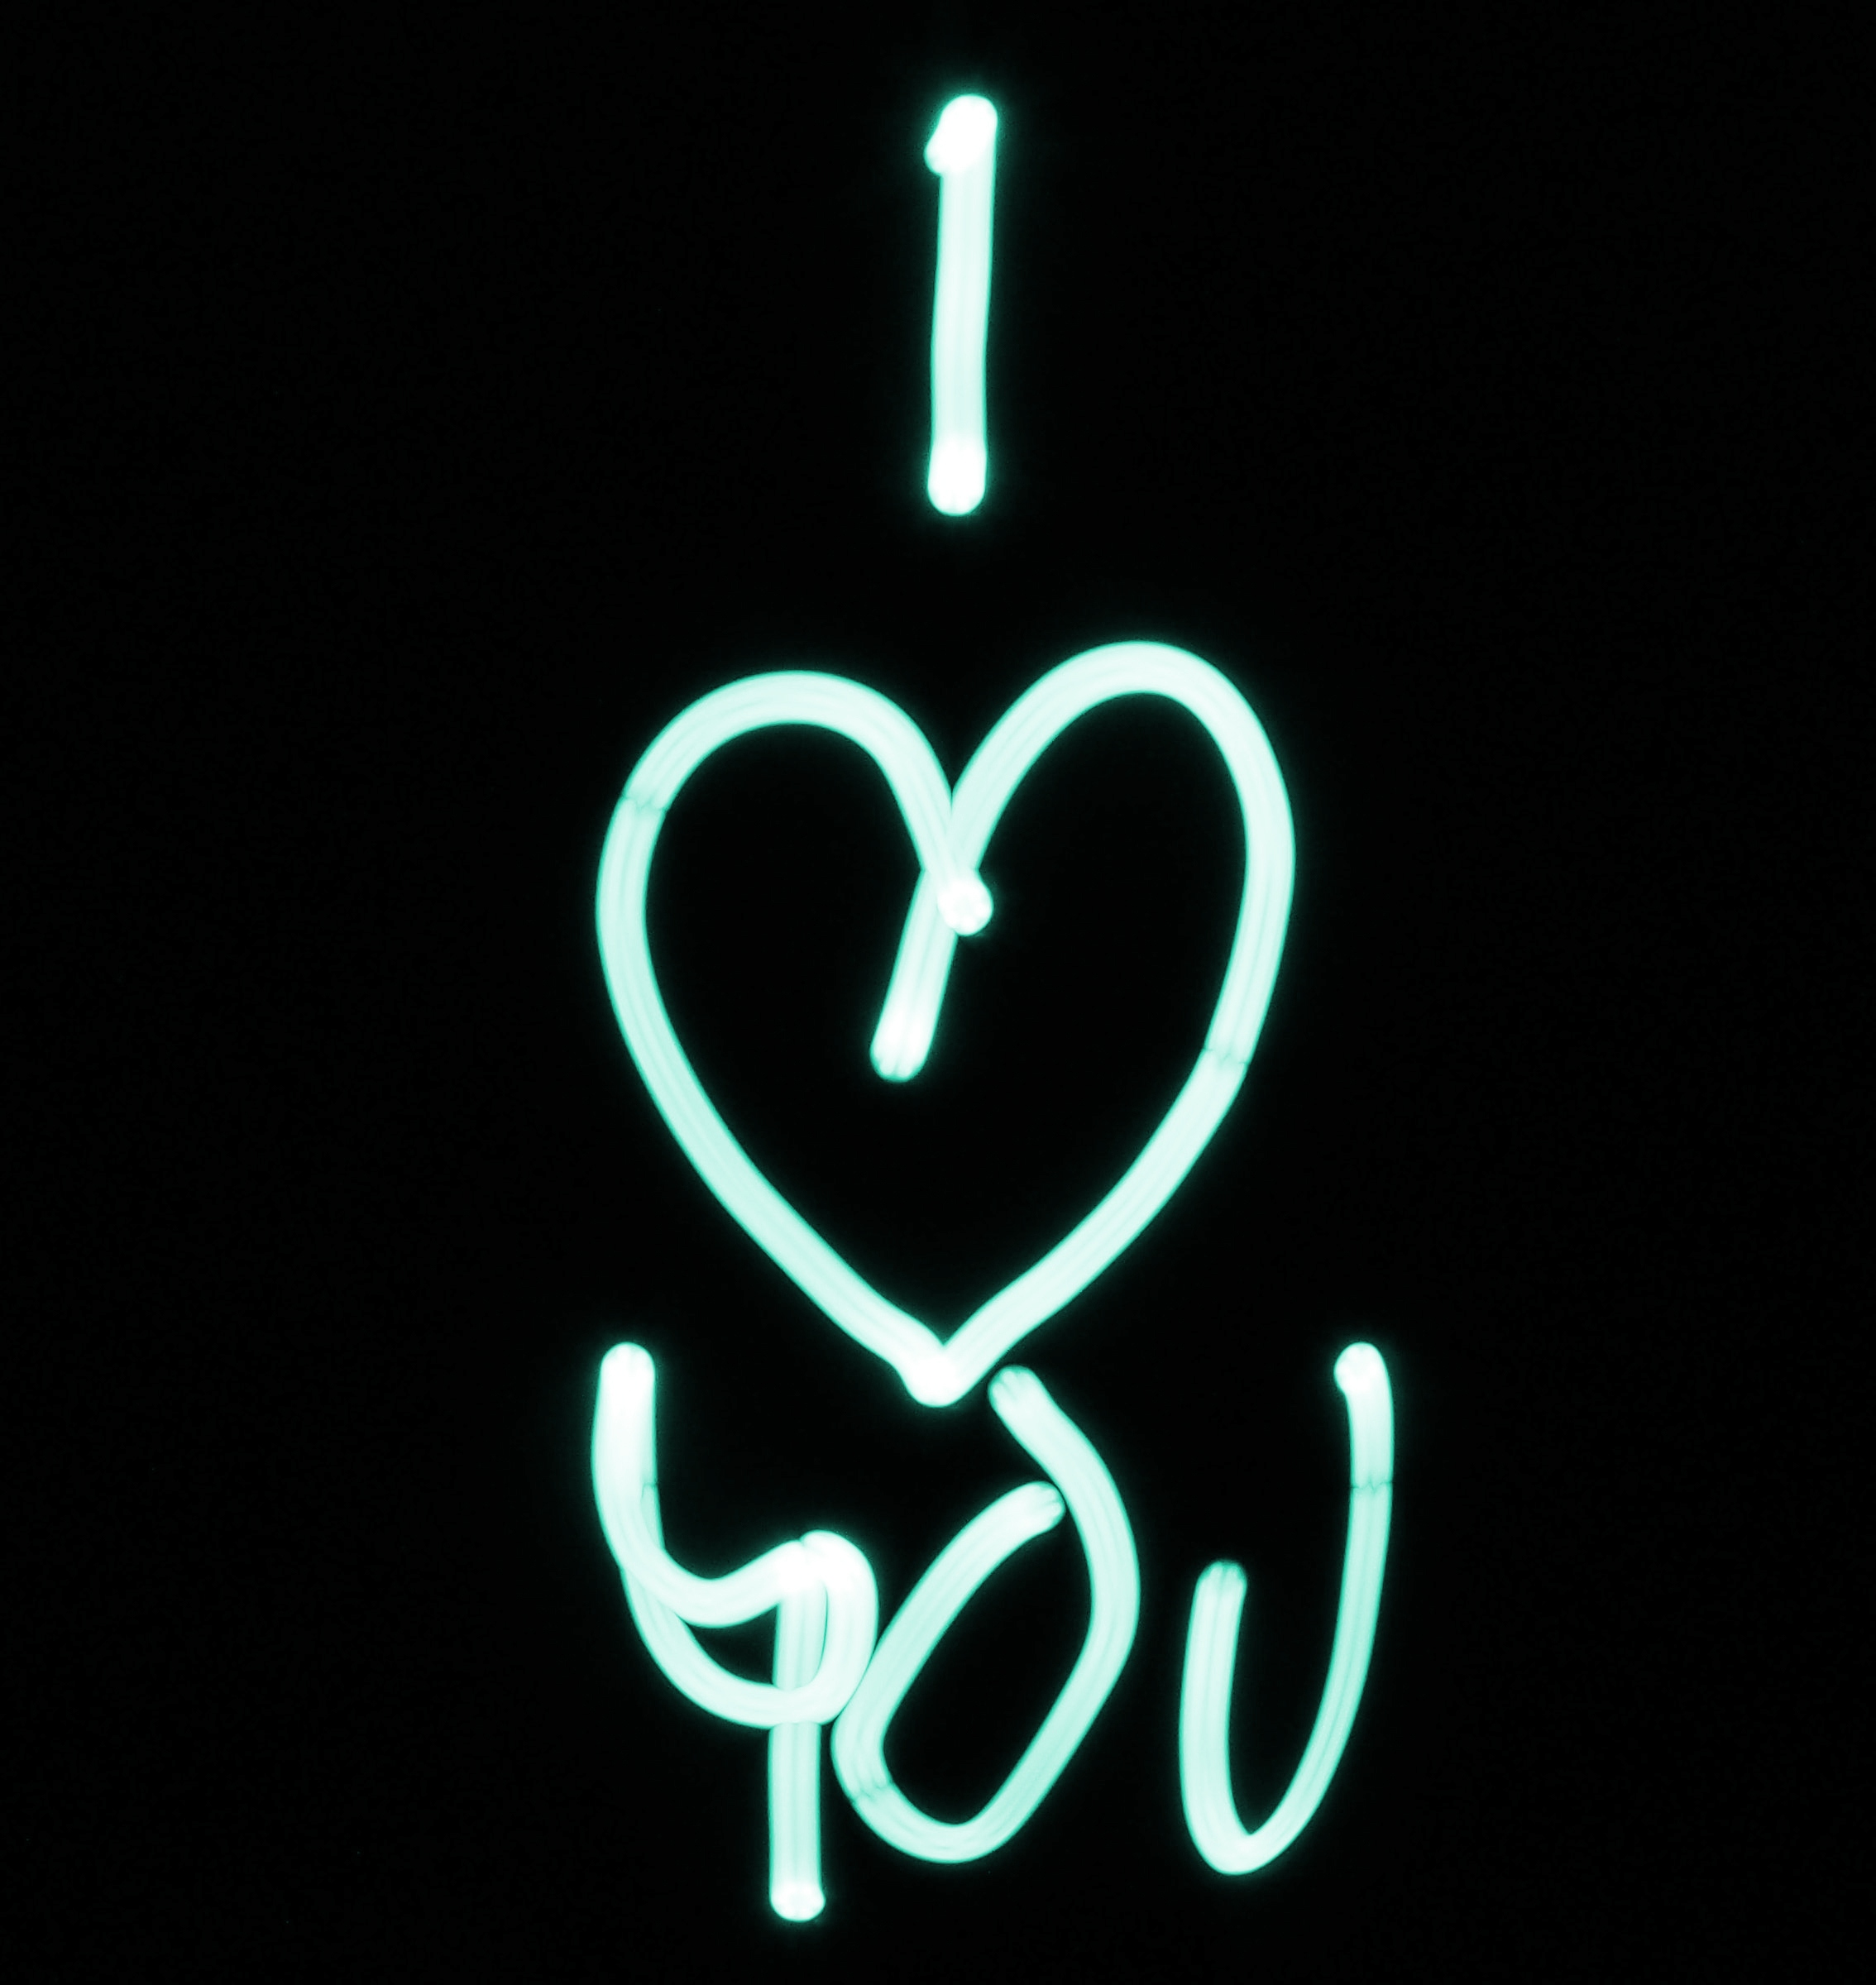 I Love You Images Wallpaper For Husband 2